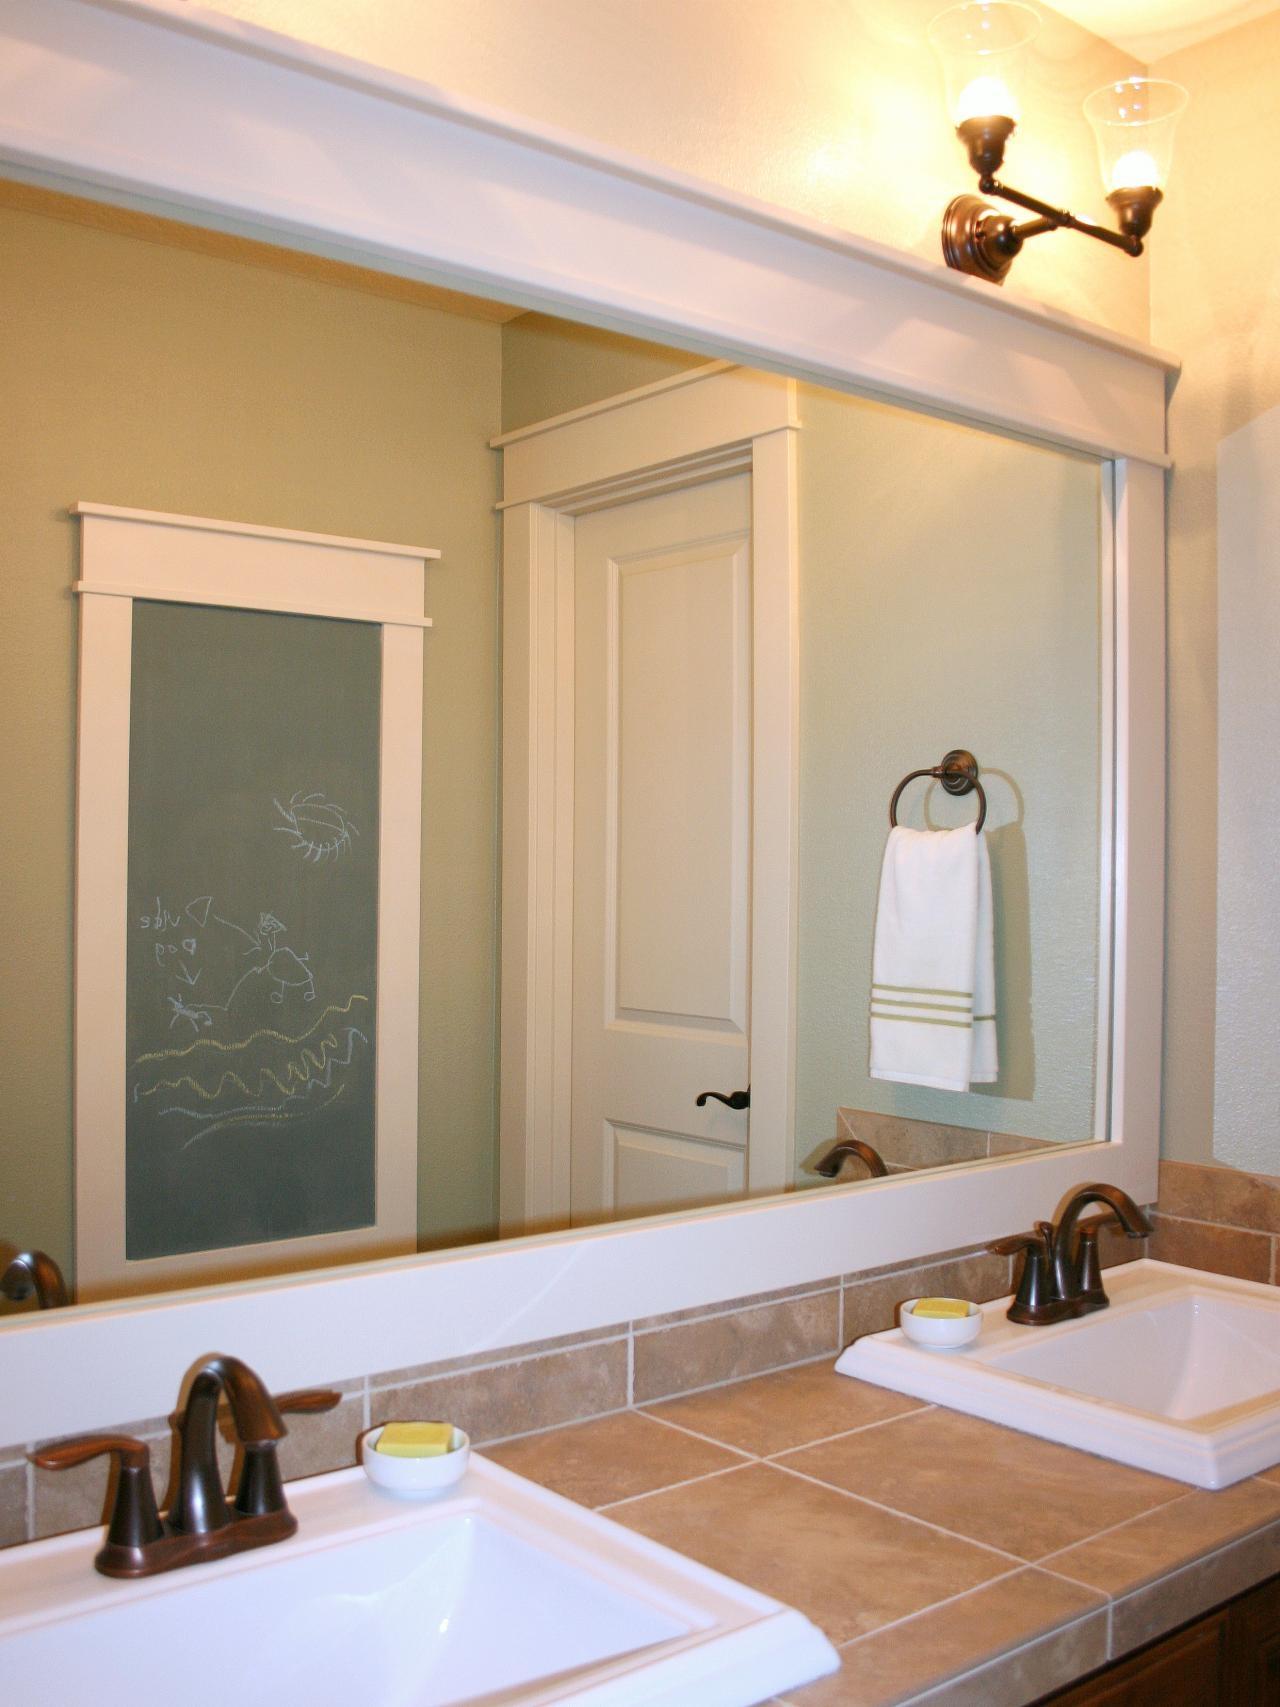 Bathroom Elegant Bathroom Decor With Large Framed Bathroom Intended For Venetian Bathroom Mirror (View 10 of 15)